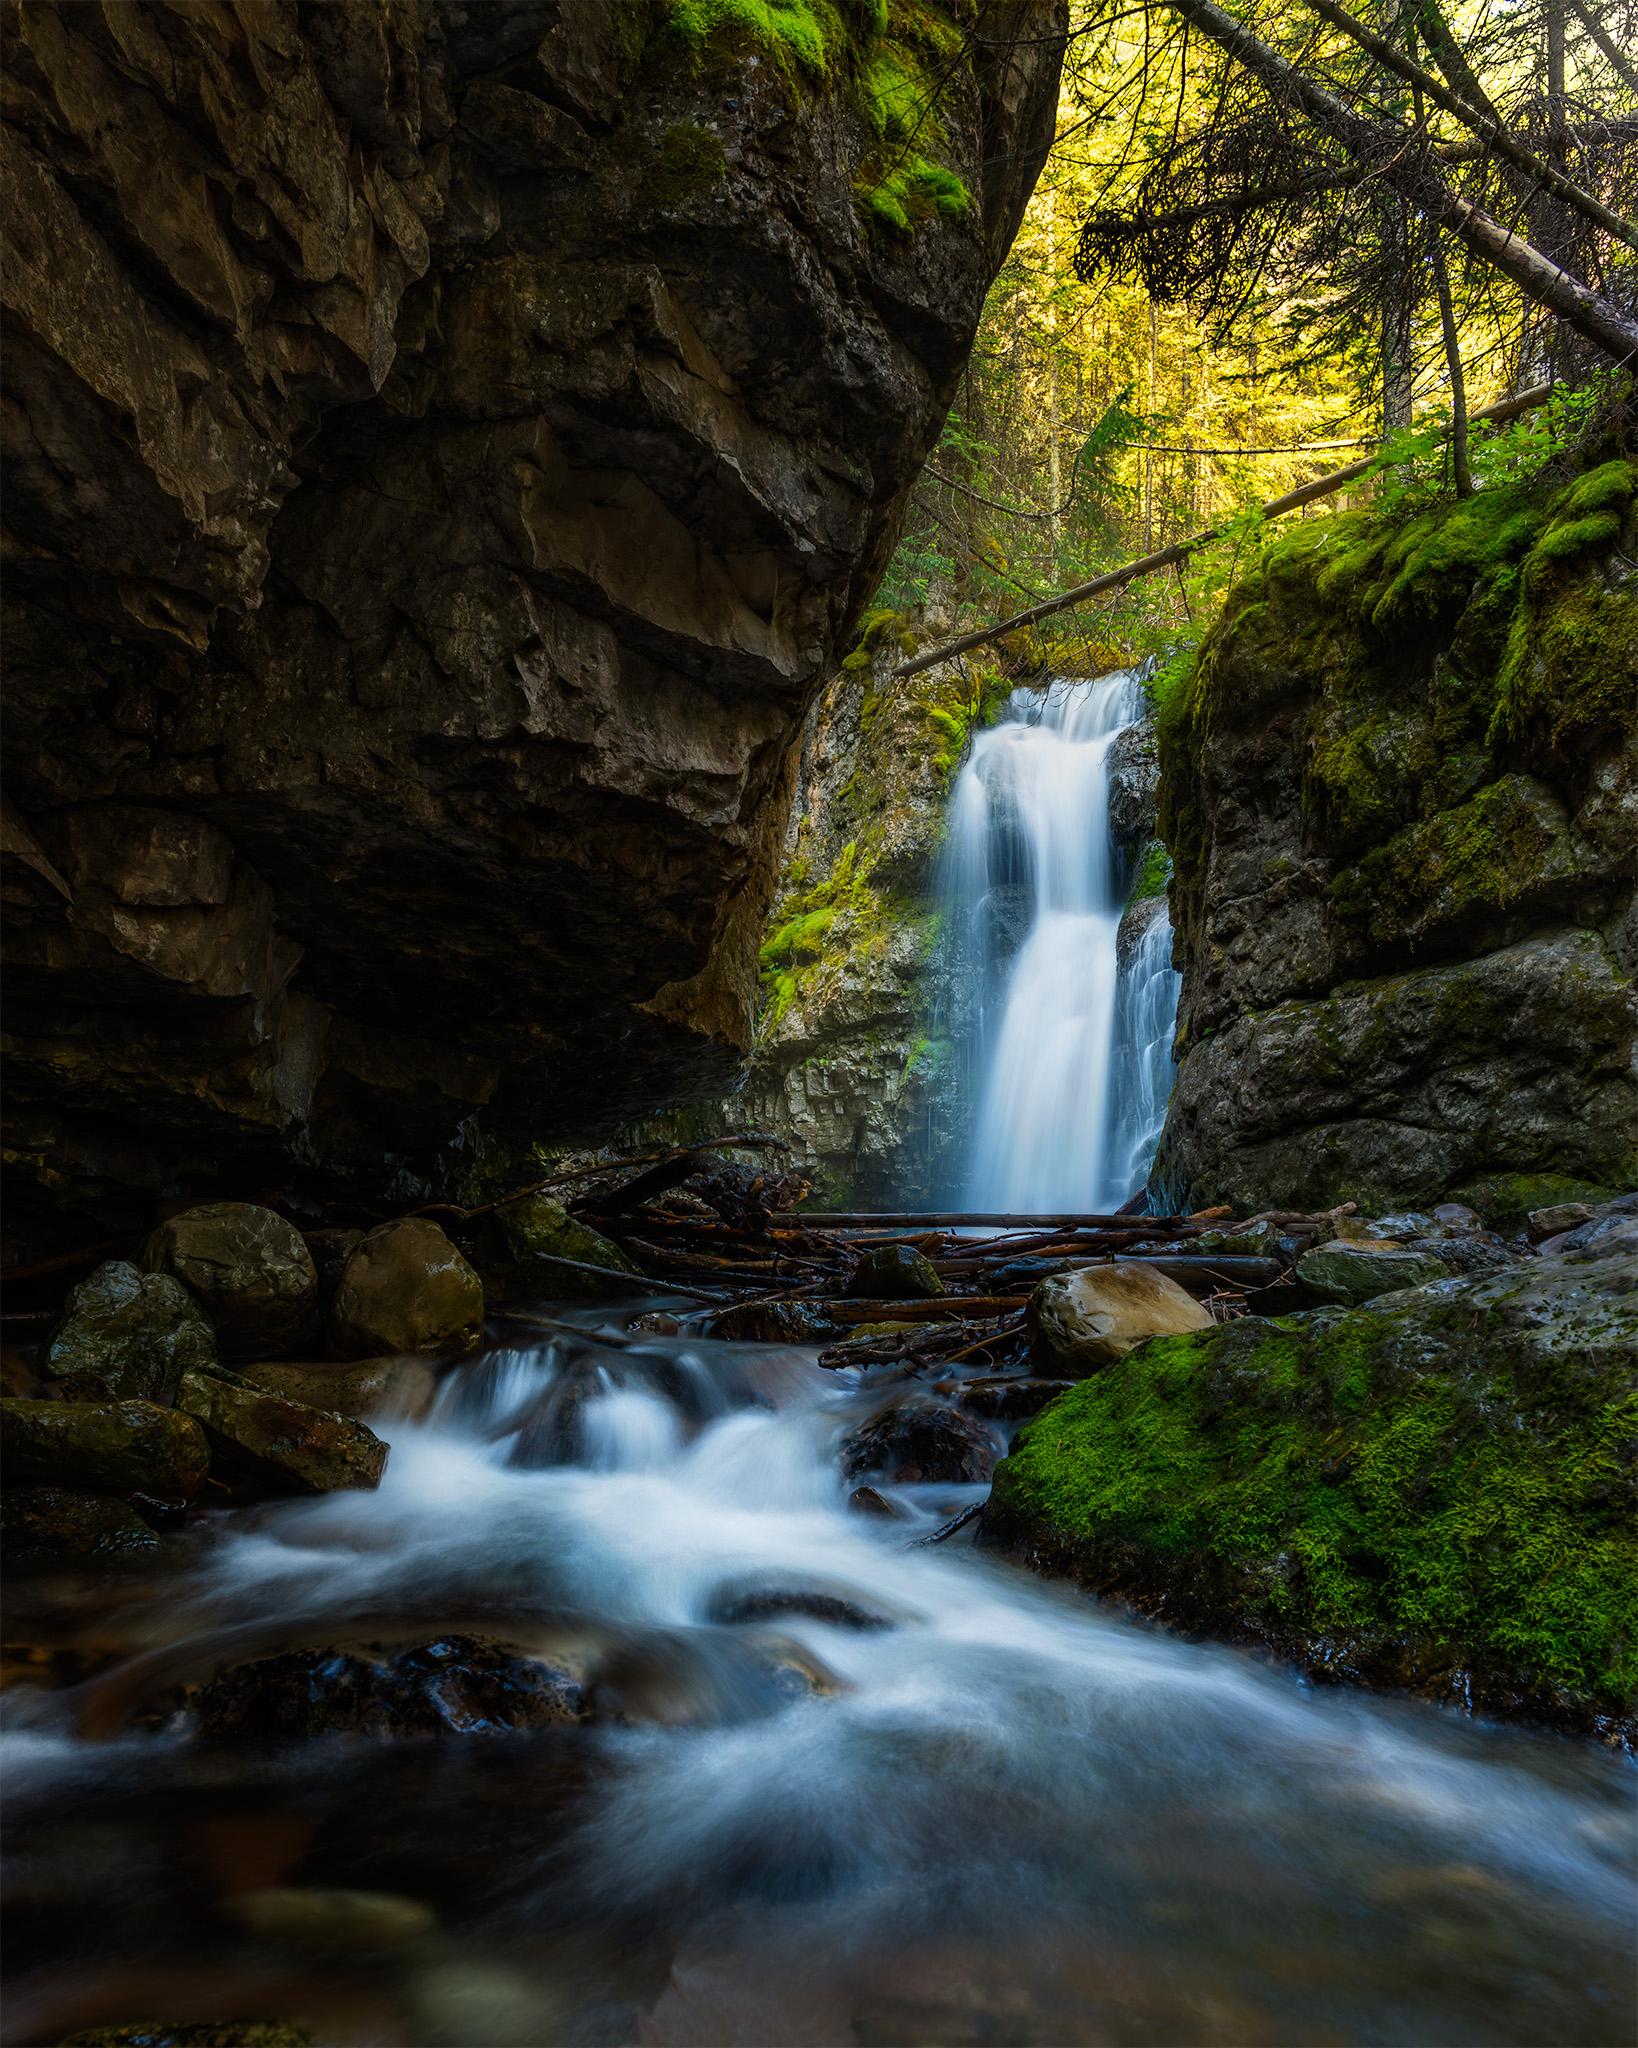 A landscape photograph of Troll Falls in Kananaskis Alberta.